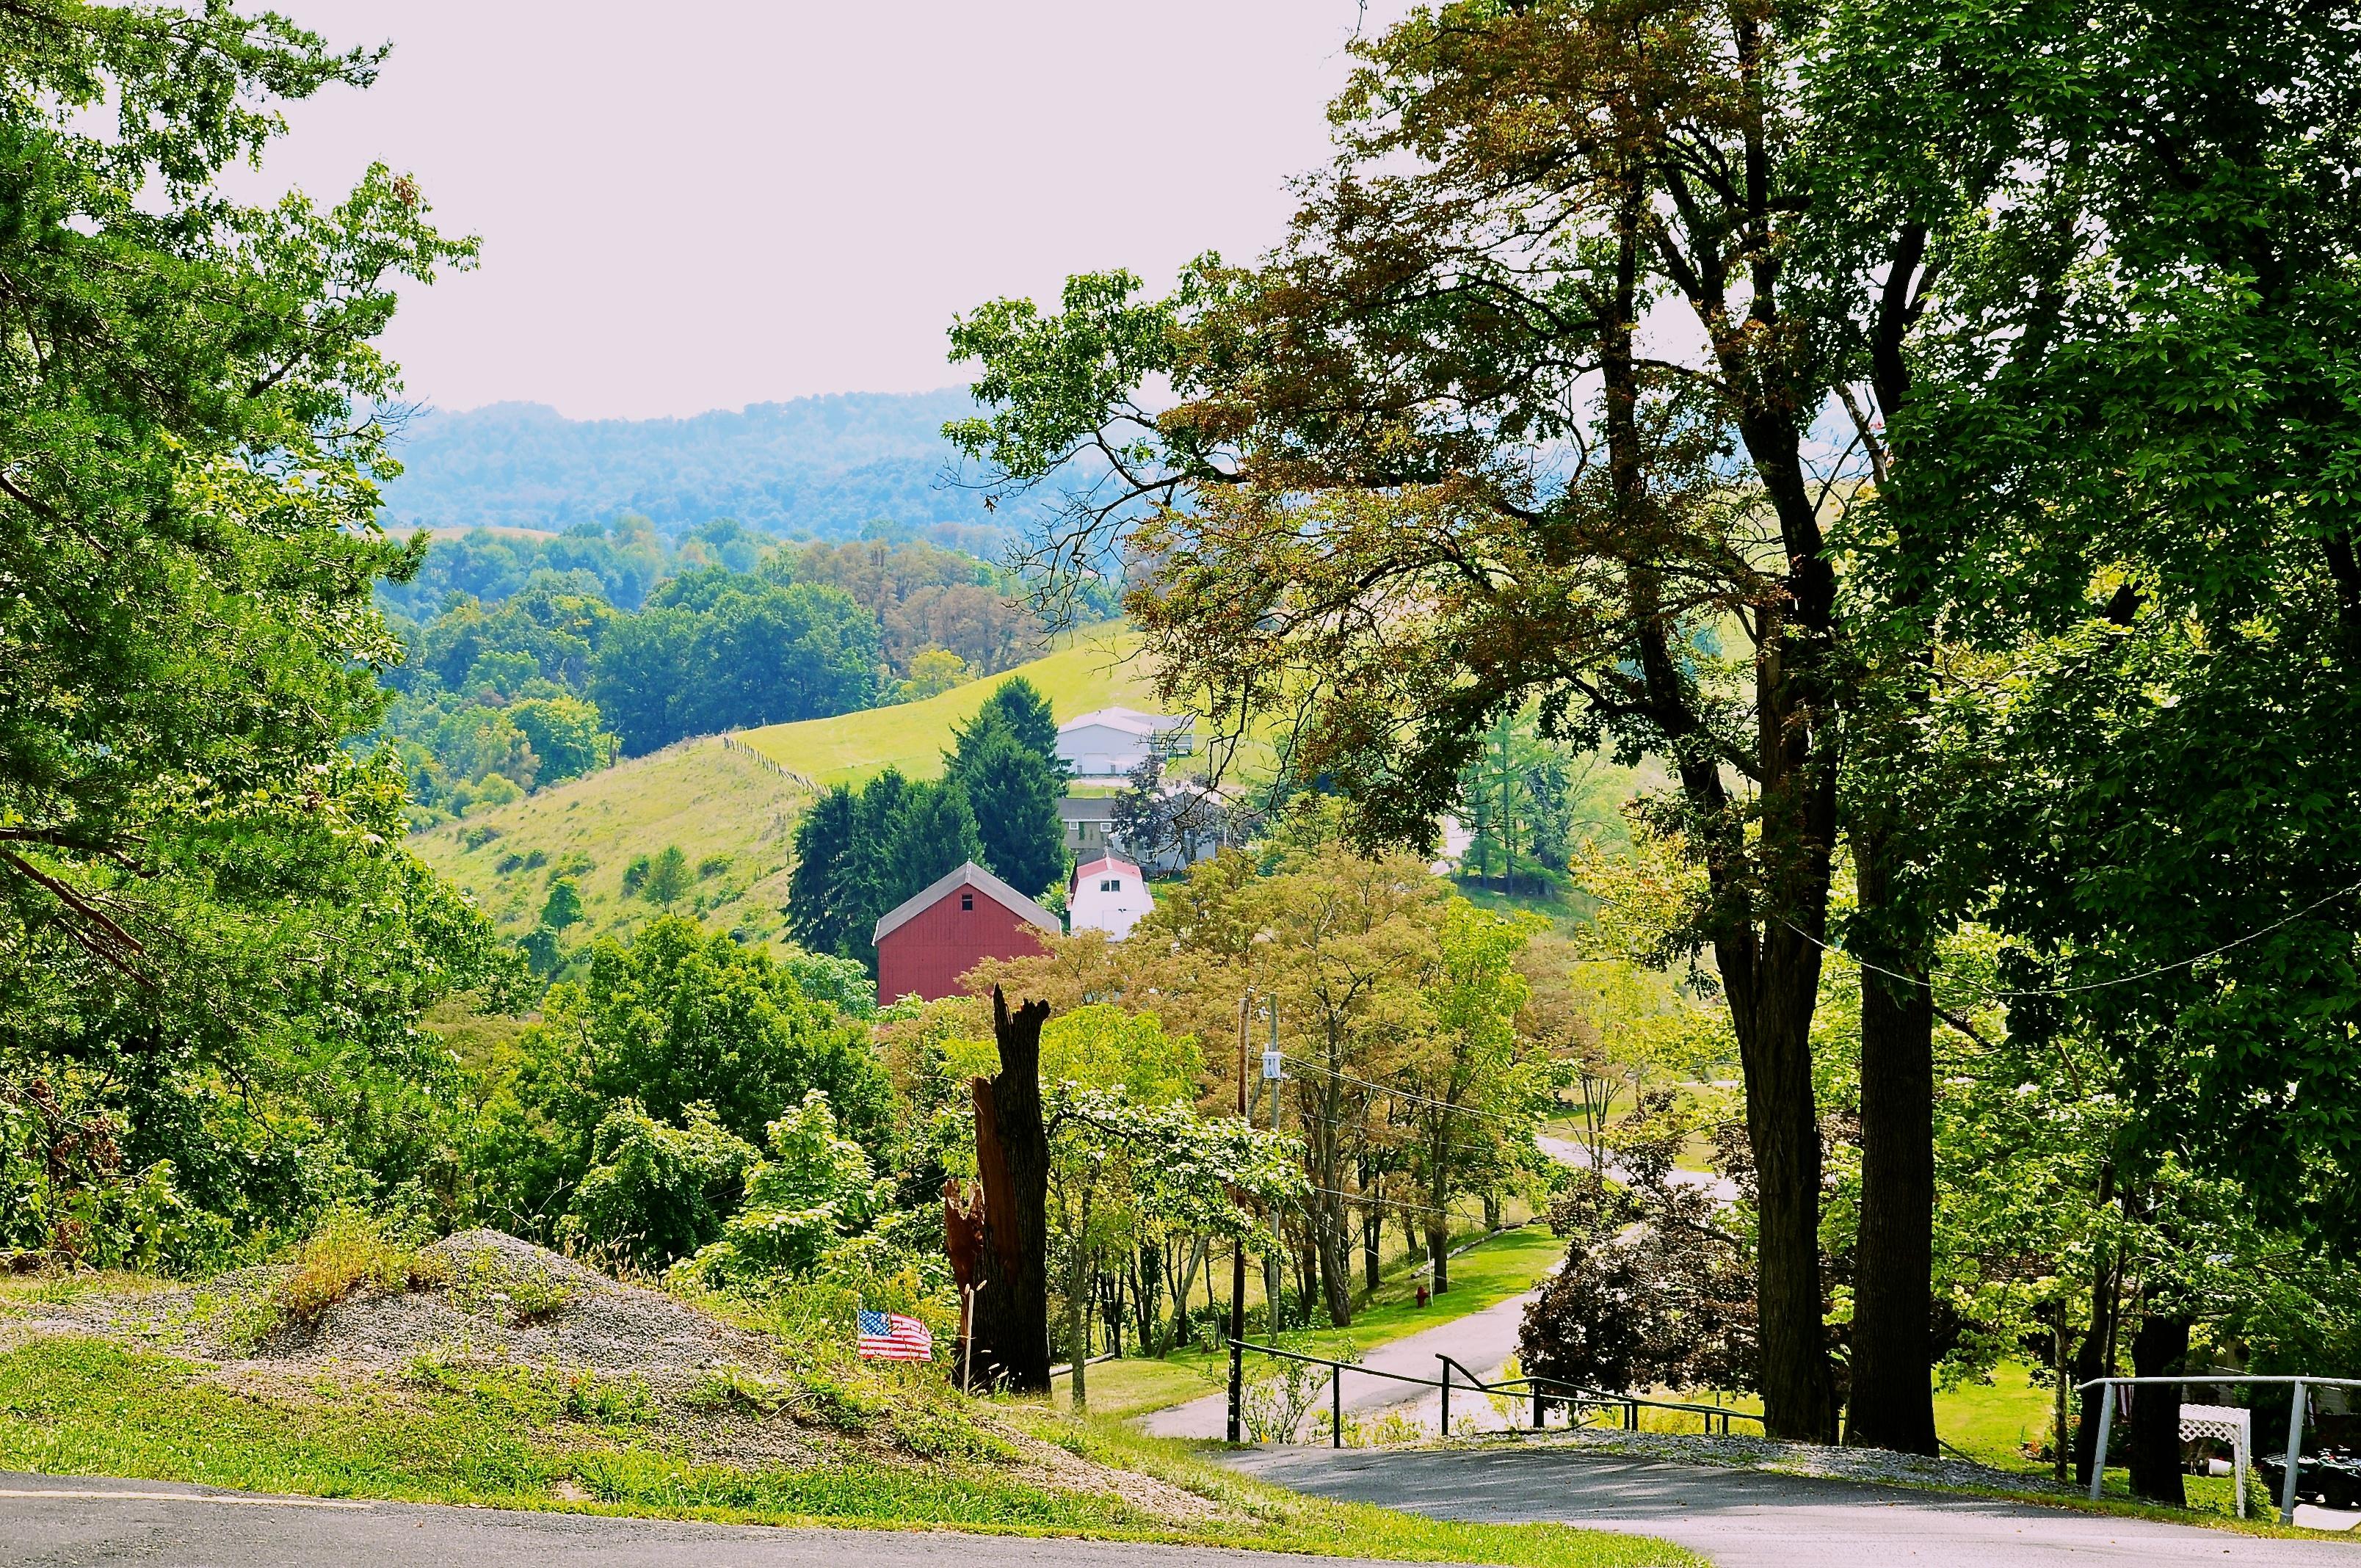 Scenic landscape in West Virginia